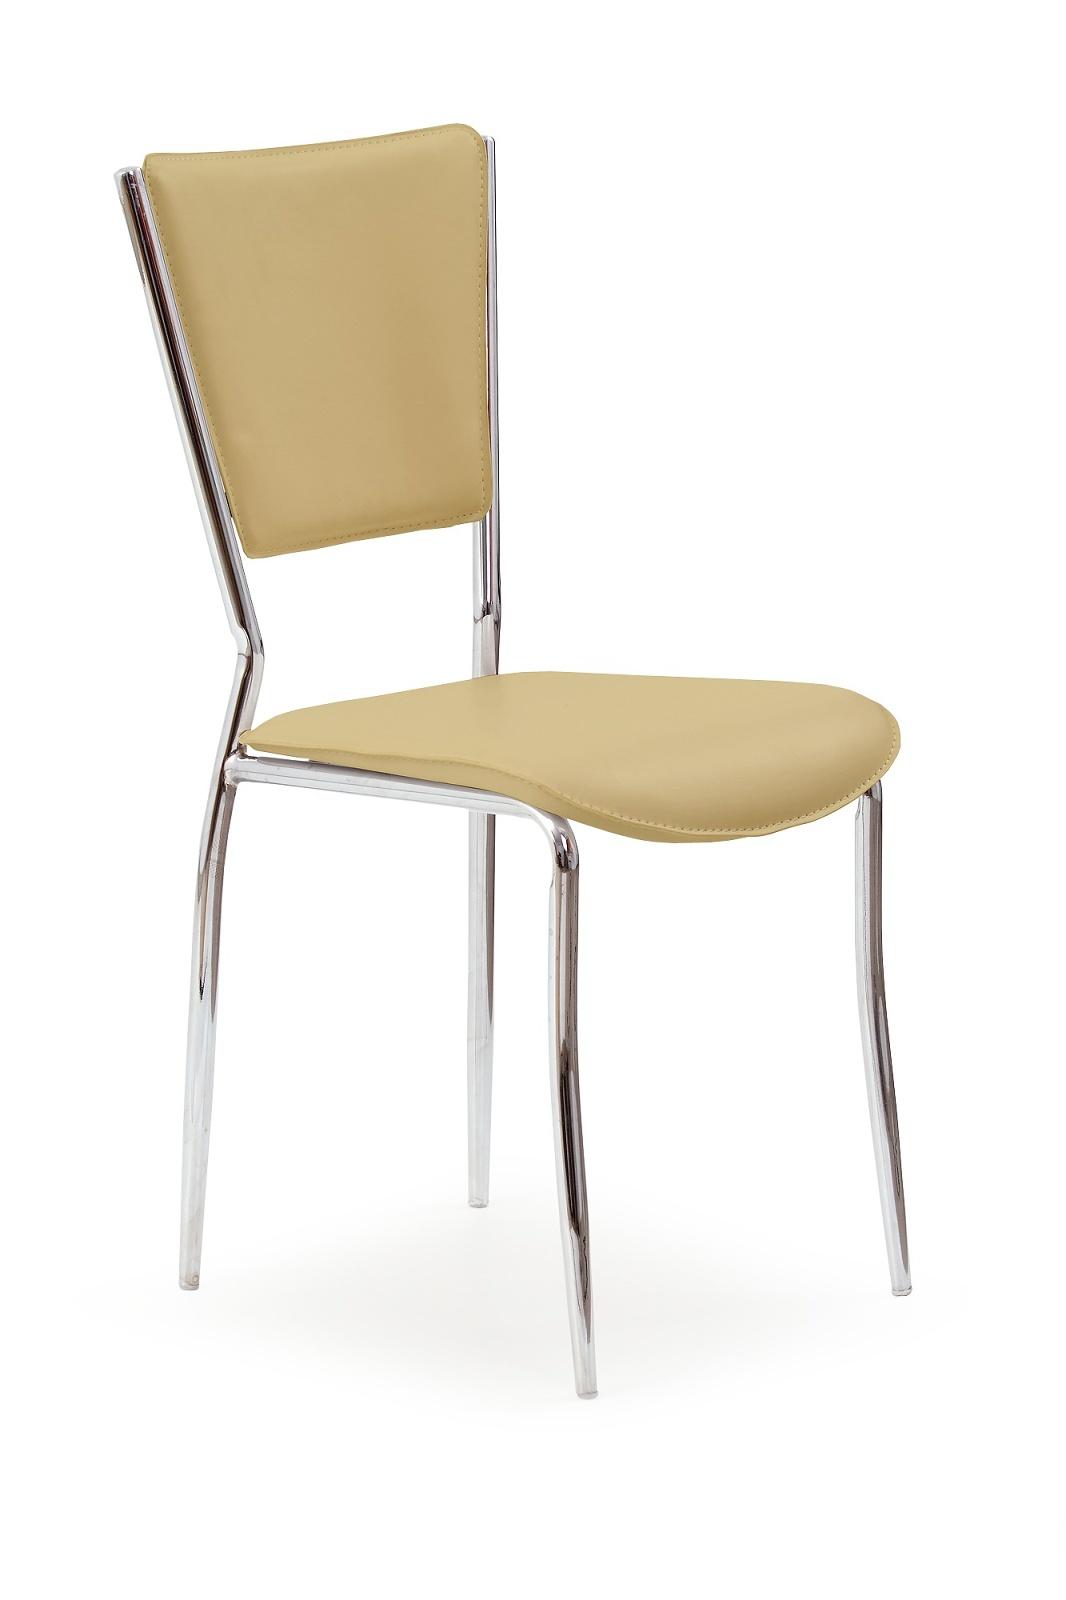 Jedálenská stolička - Halmar - K72C svetlohnedá